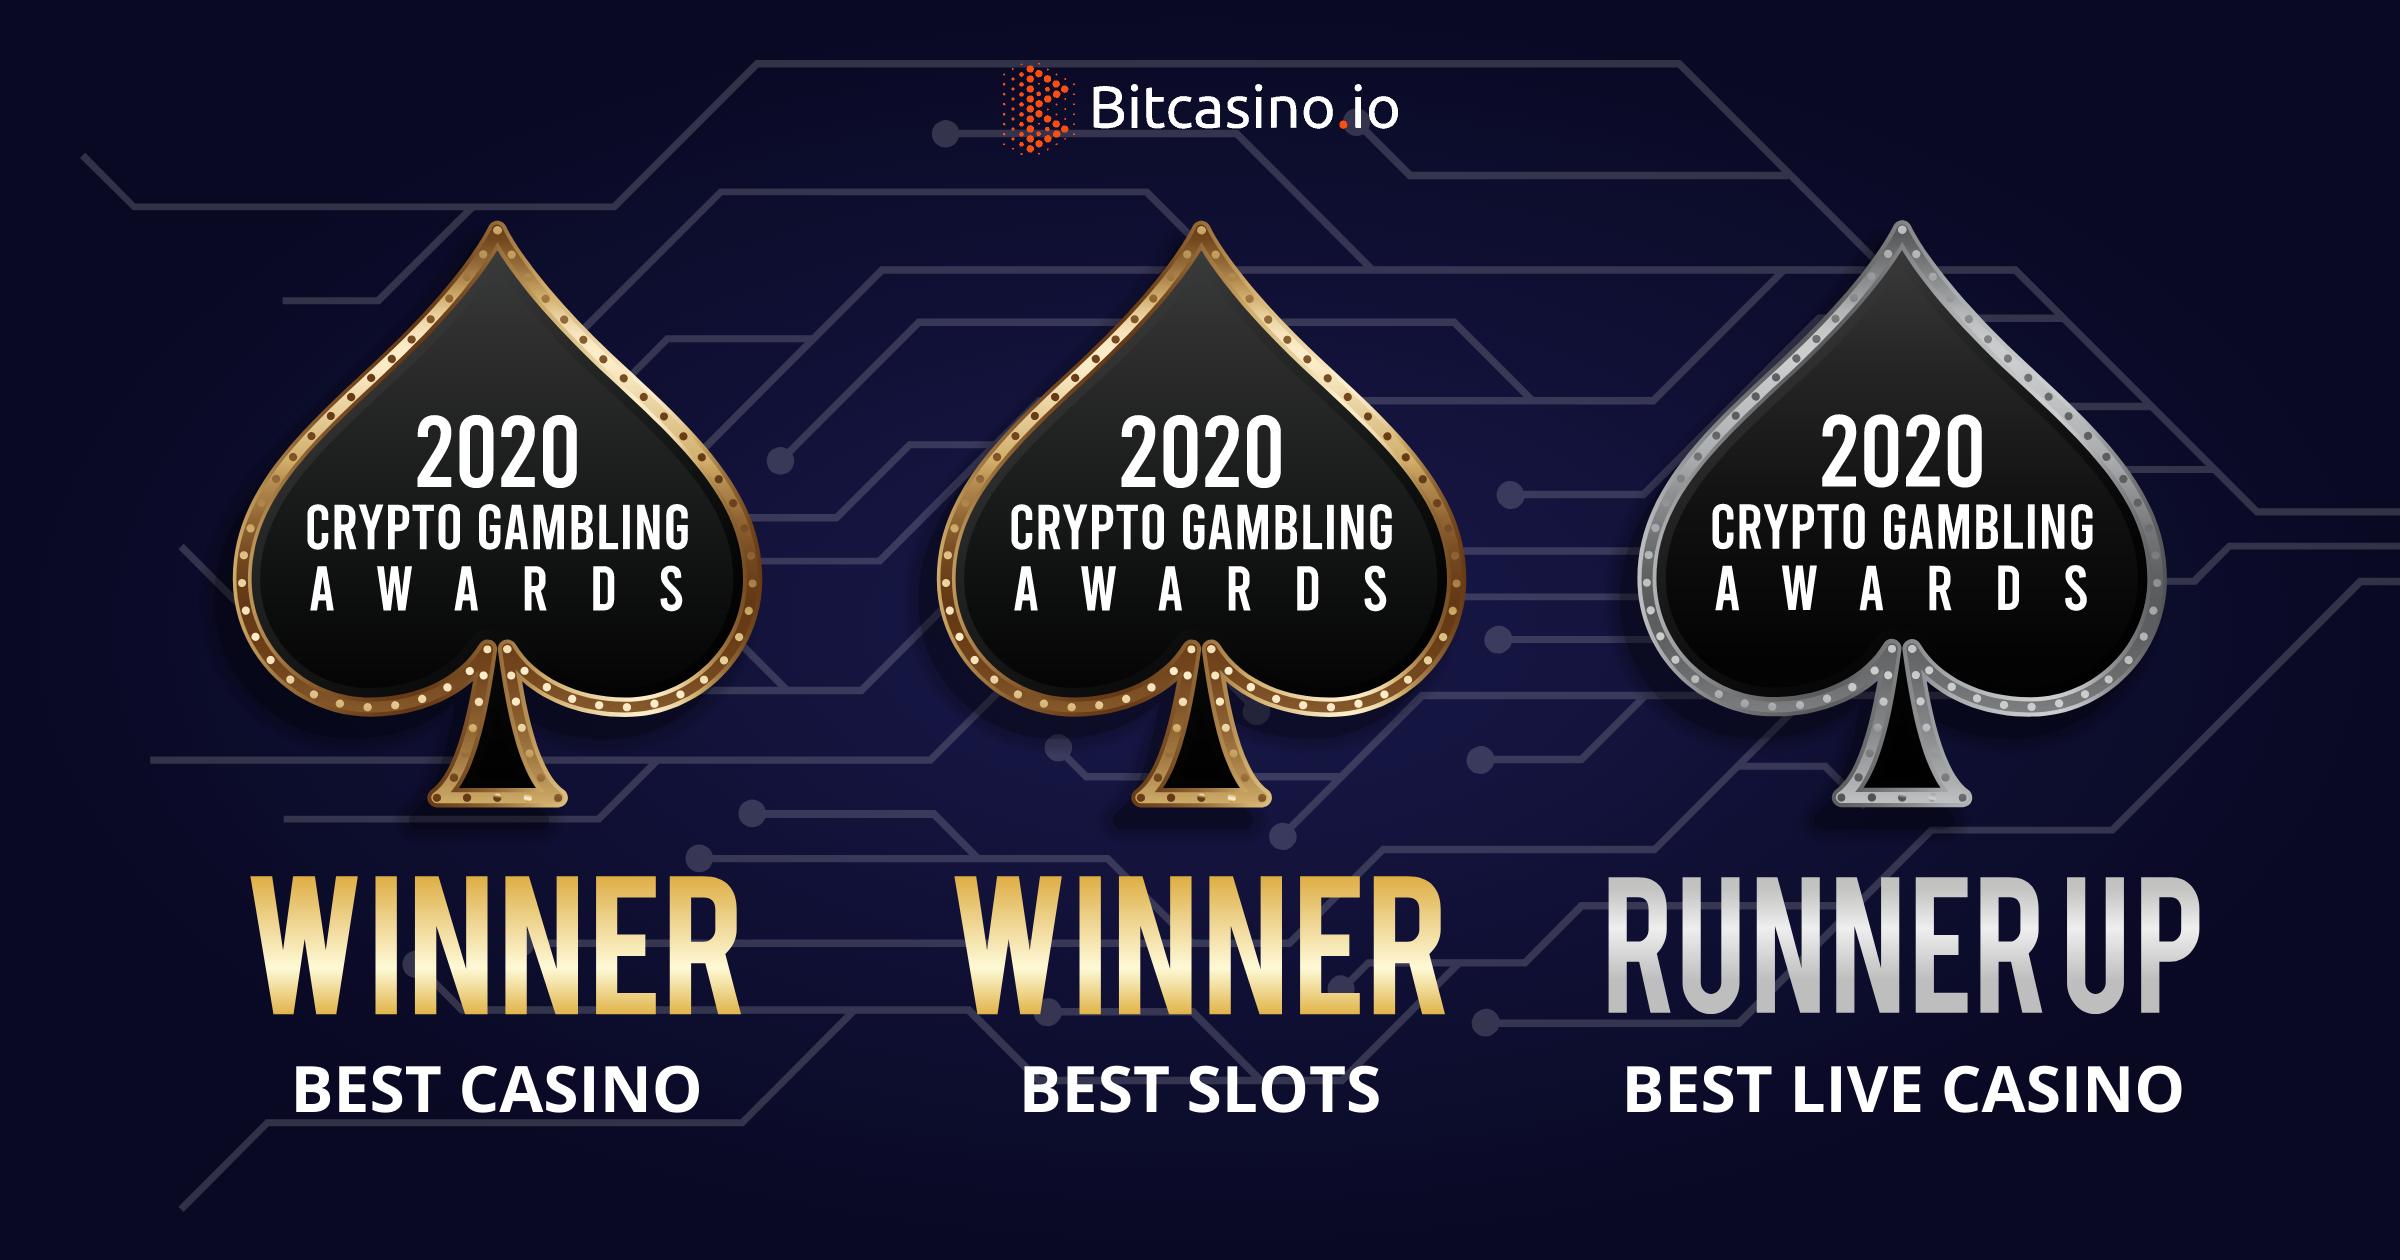 Crypto Gambling Awards won by BitCasino